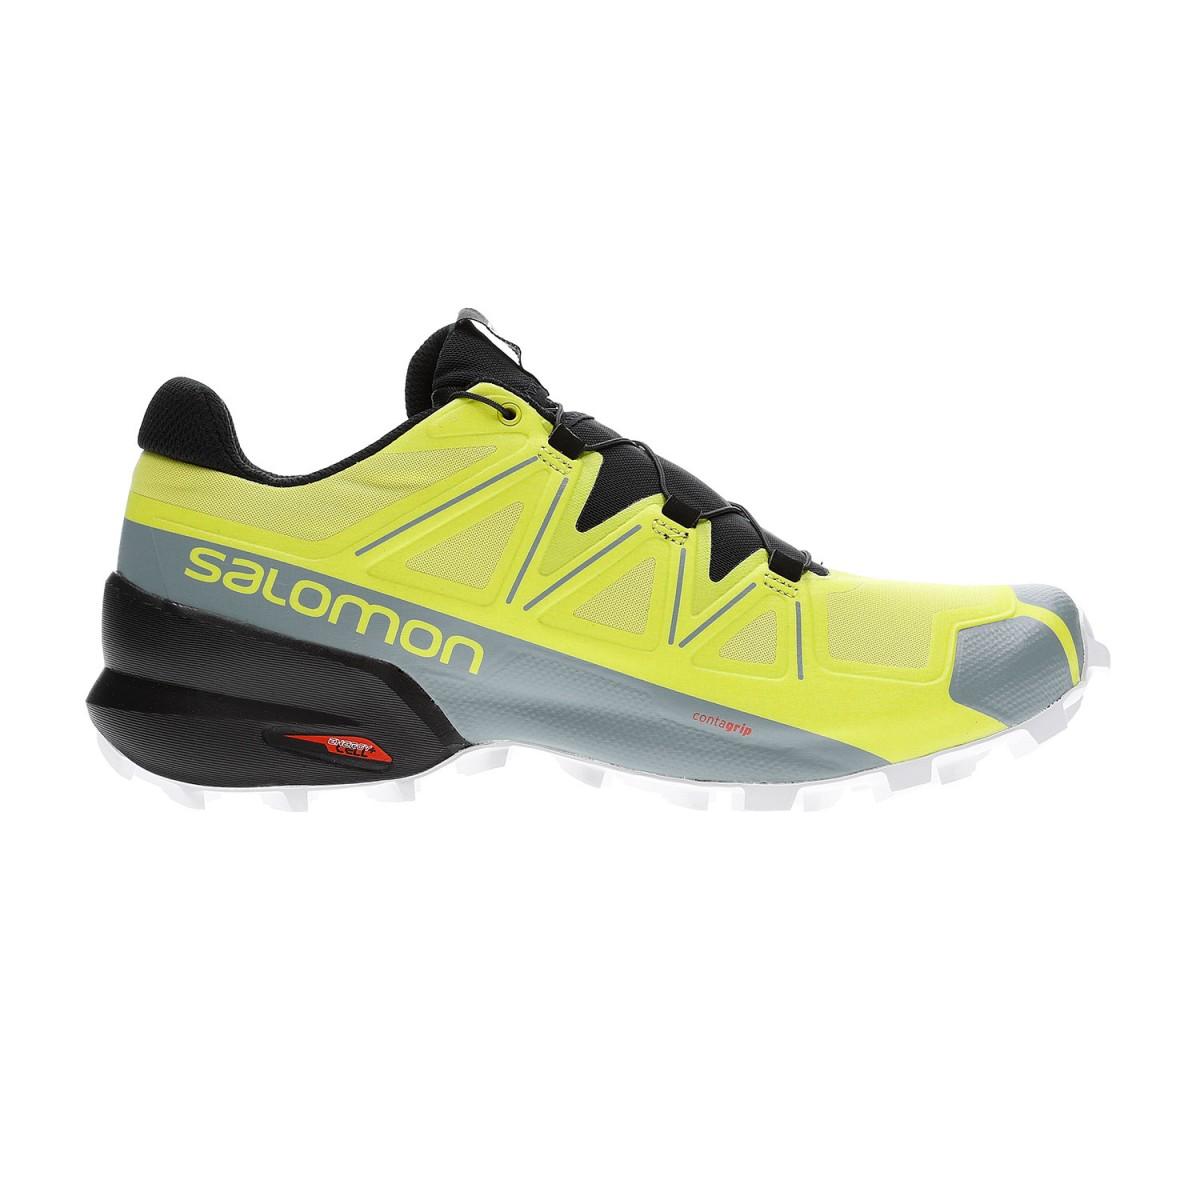 Speedcross 5 Sulphur Black Scarpe Trail Running Unisex